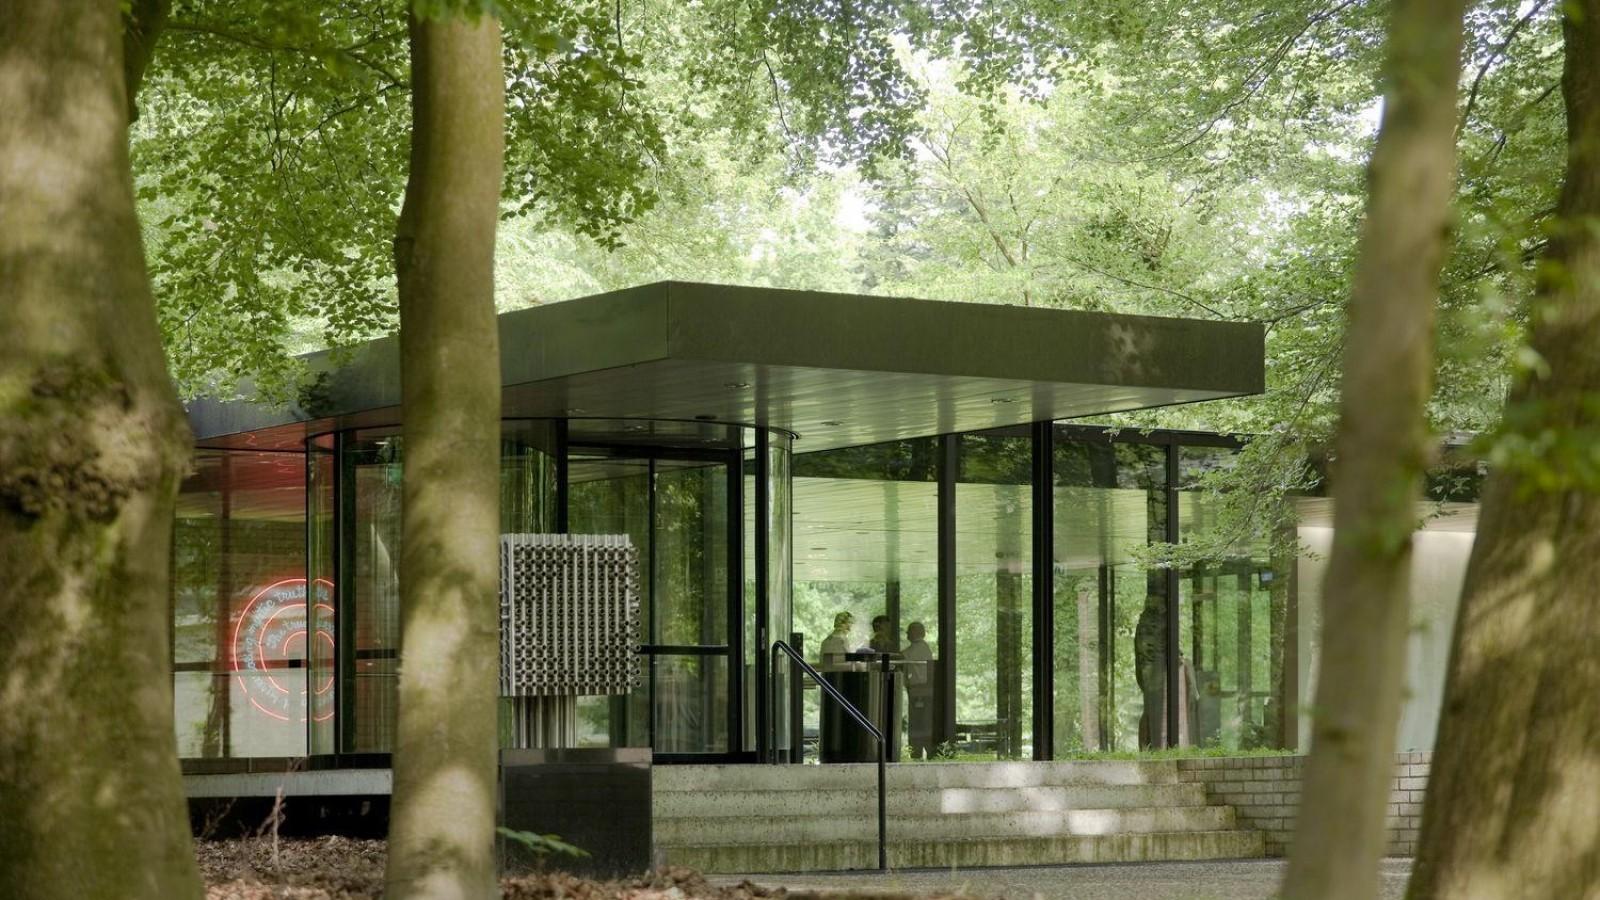 Dit is het Kröller-Müller Museum